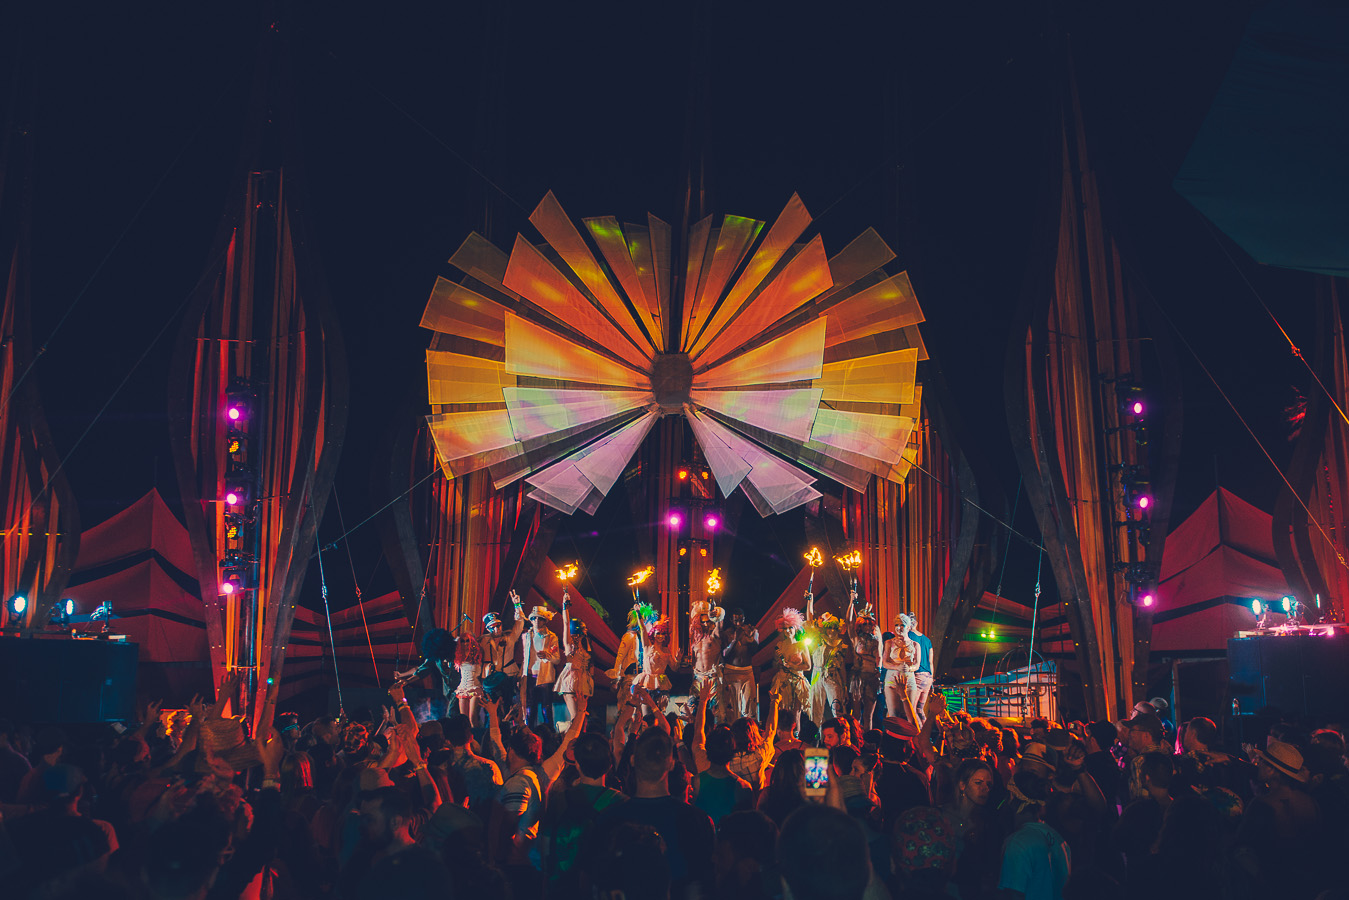 Lucent Dossier Crowd Stage DoLaB-Coachella-2014-by-Daniel-Zetterstrom-1.jpg